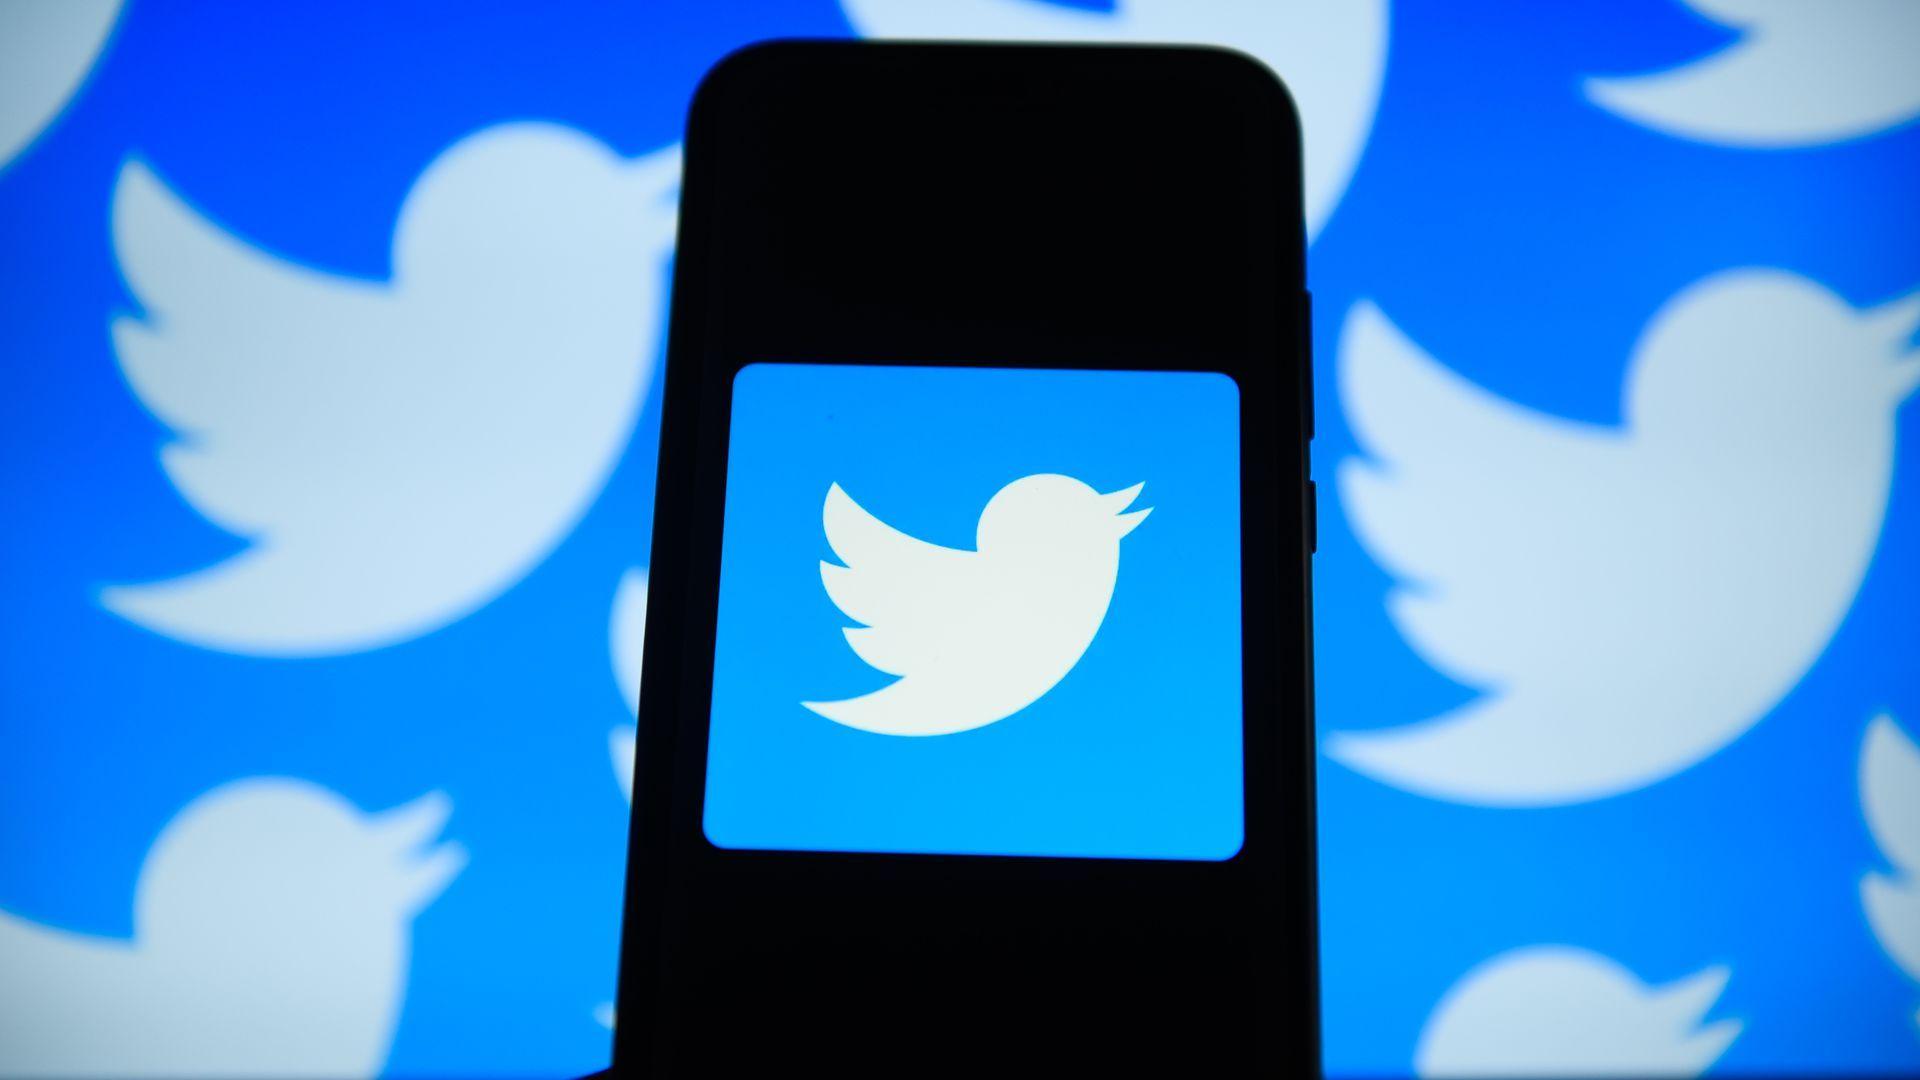 Twitter warns 'unusual activity' from hackers in China, Saudi Arabia